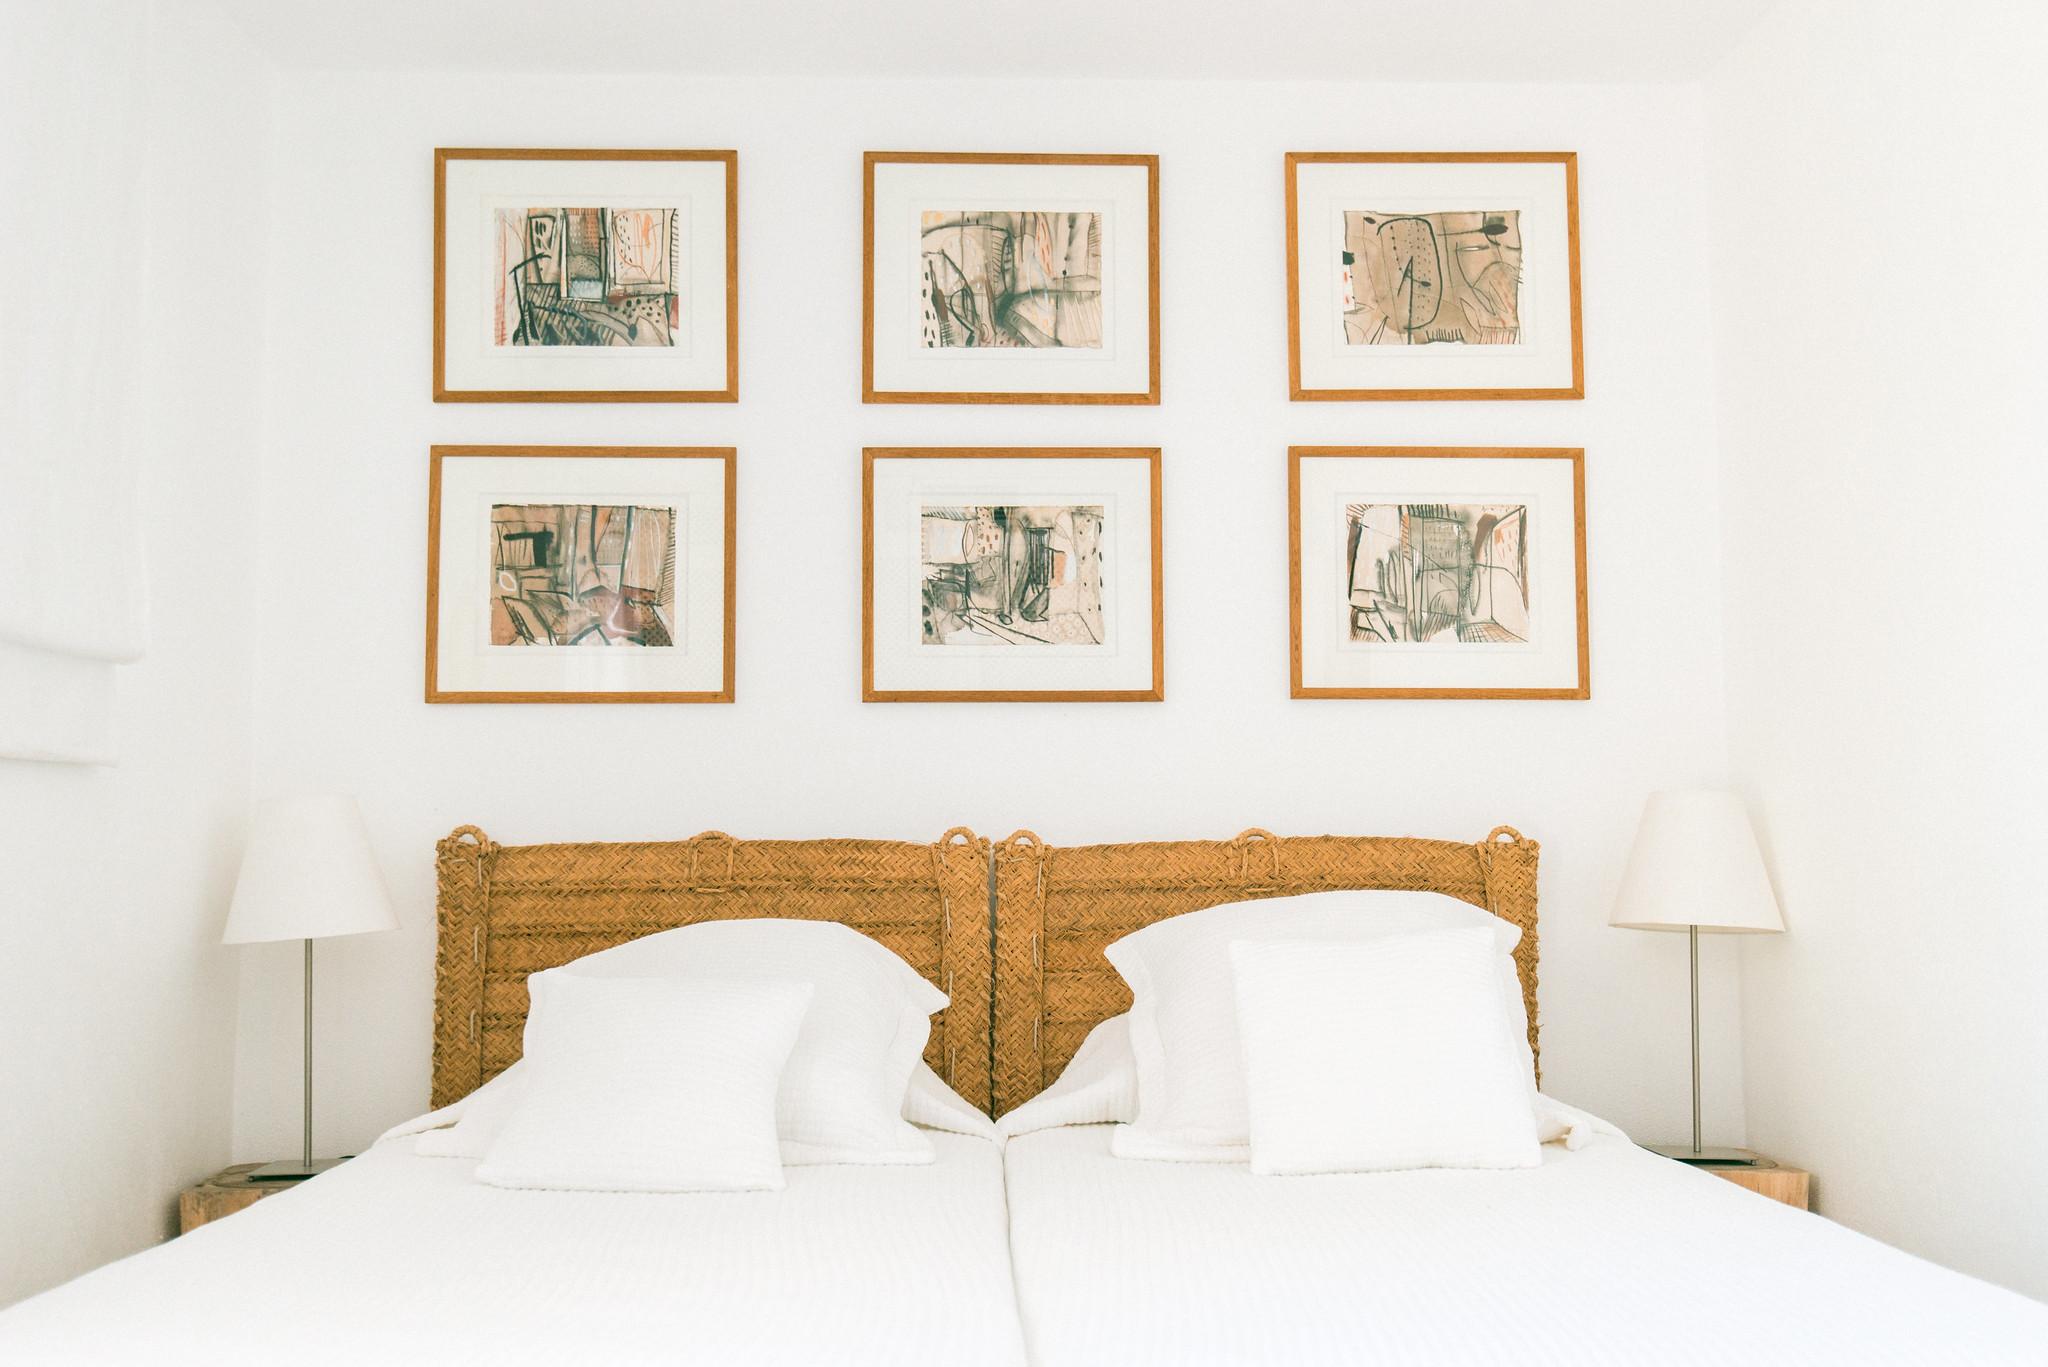 https://www.white-ibiza.com/wp-content/uploads/2020/06/white-ibiza-villas-casa-odette-interior-bedroom2.jpg